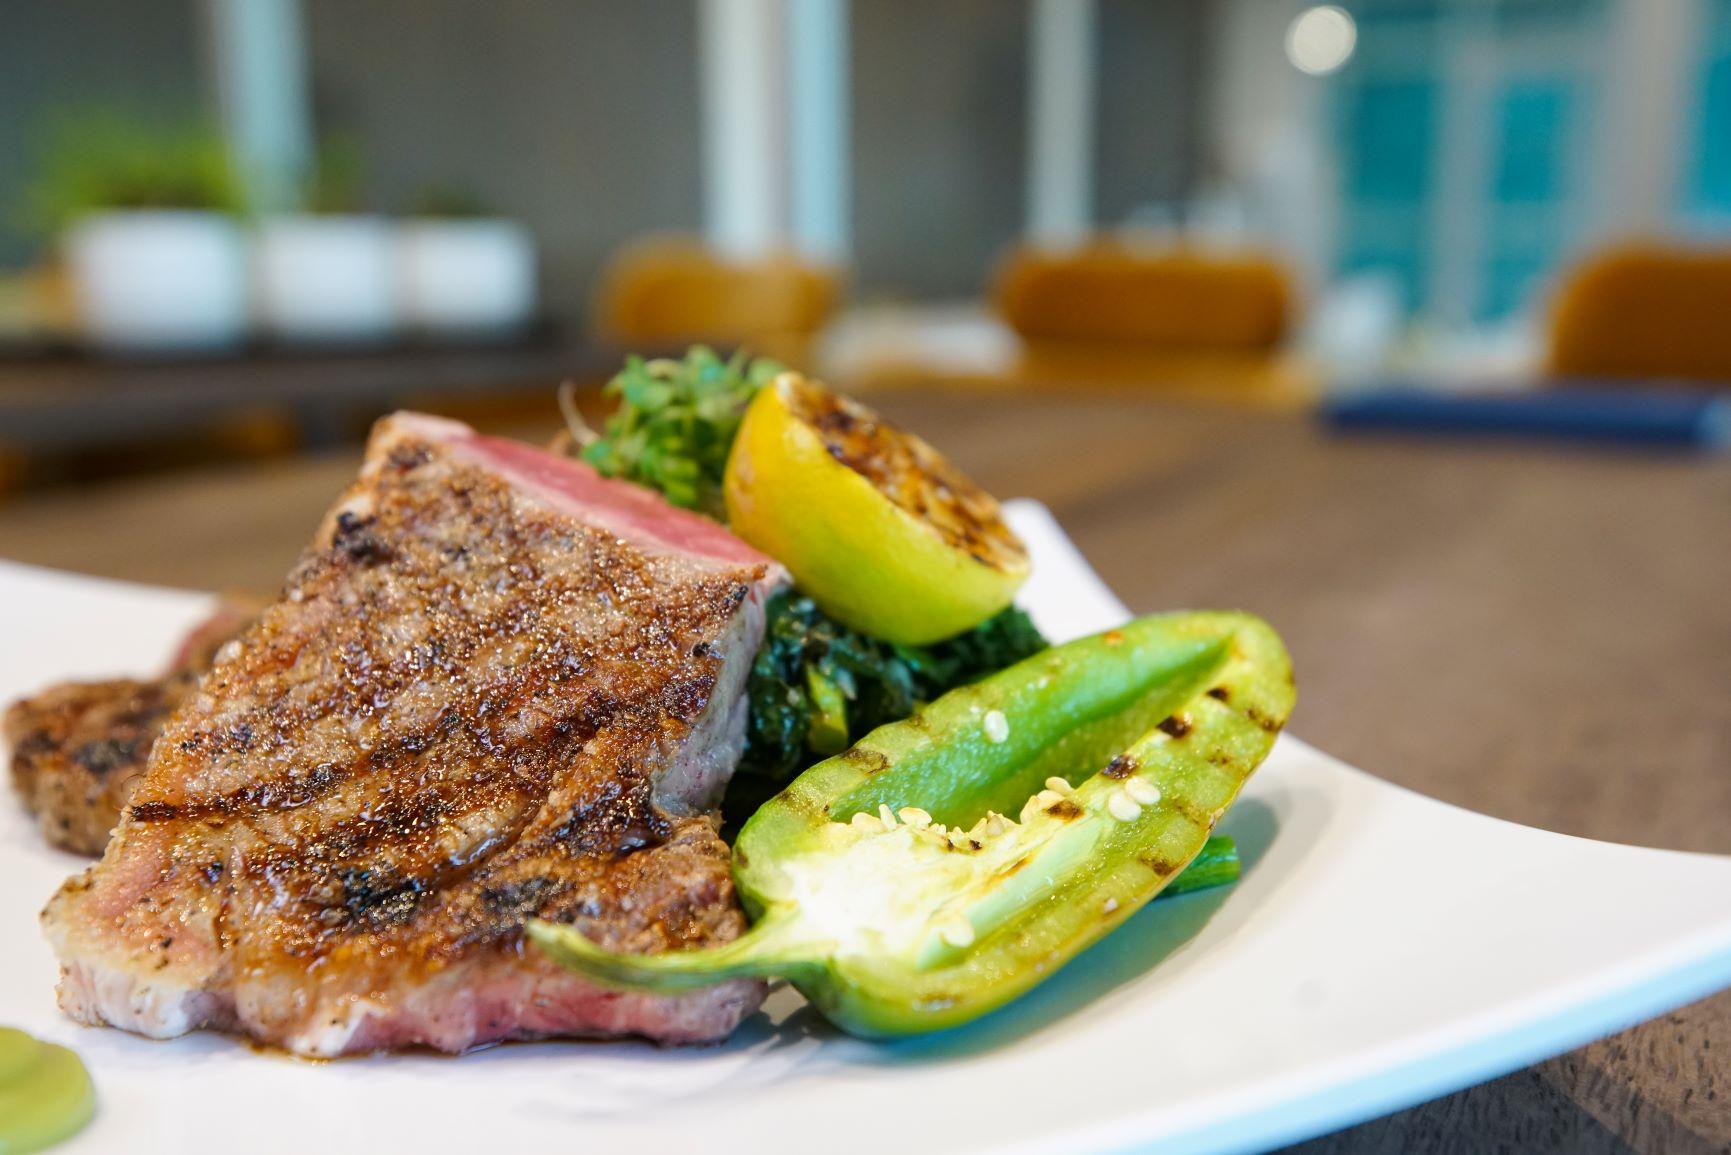 Niman Ranch NY Striploin Steak